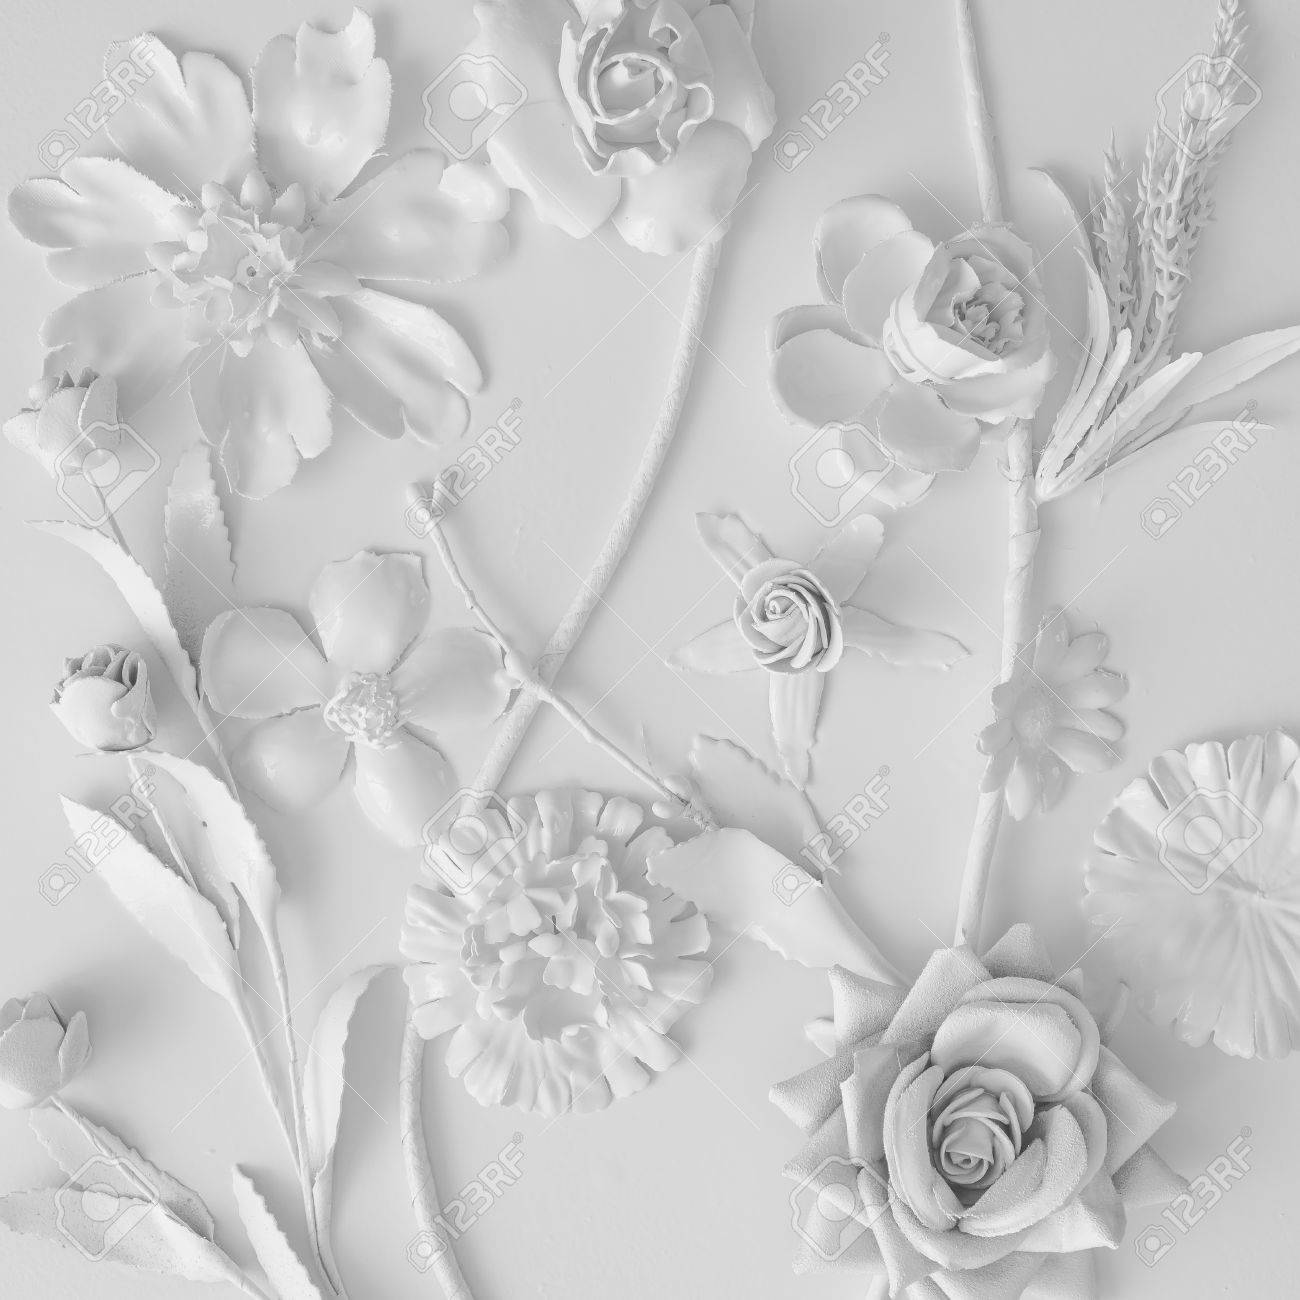 White flowers texture creative minimal concept flat lay stock stock photo white flowers texture creative minimal concept flat lay mightylinksfo